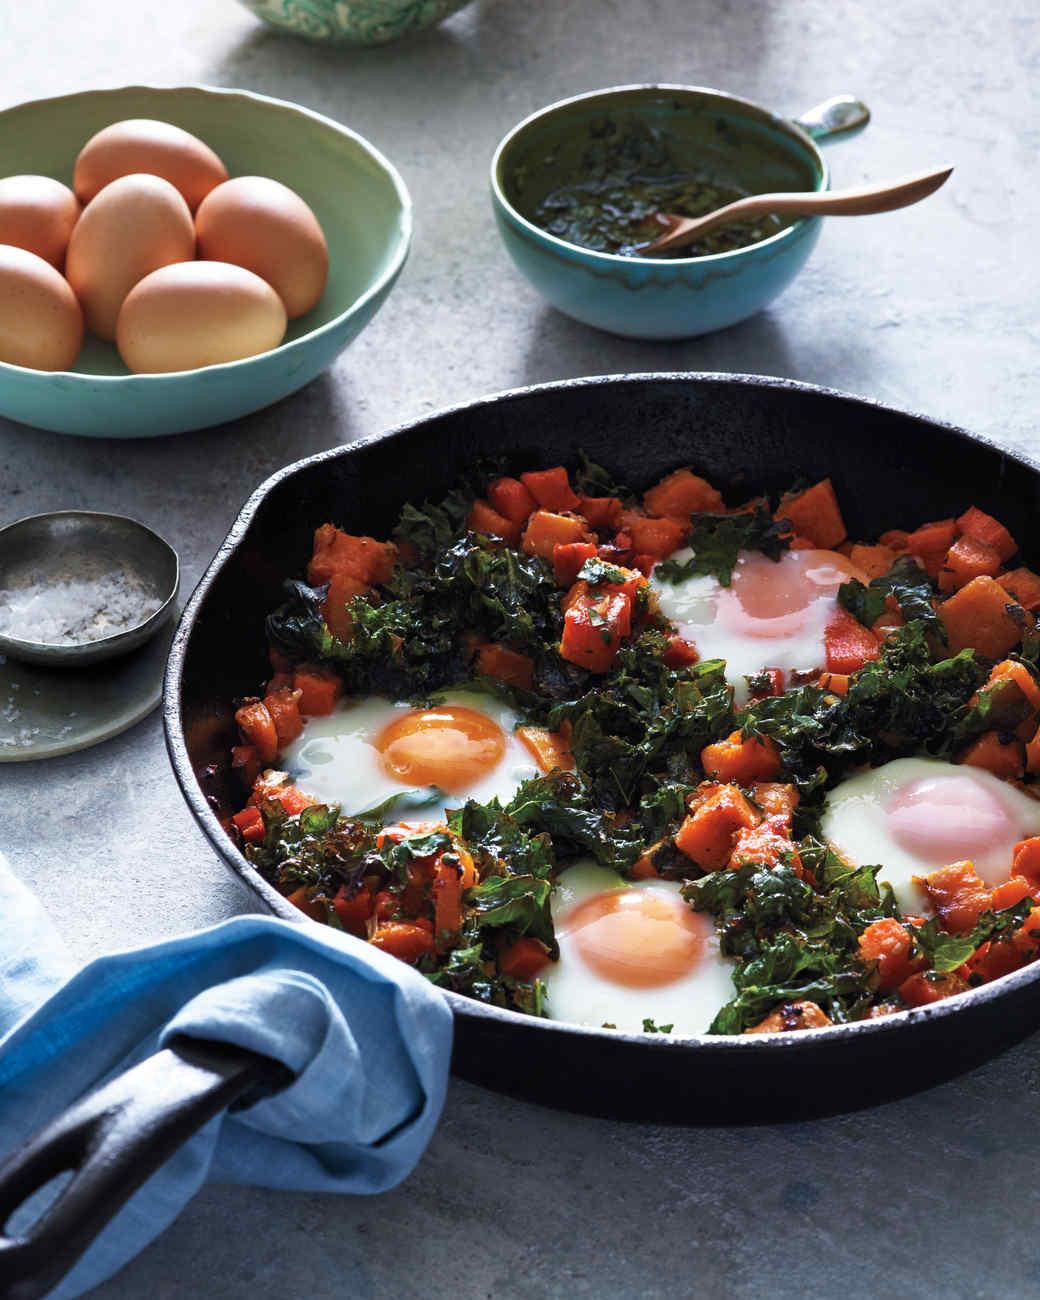 Low Carb Recipes Vegetarian  Luscious Low Carb Ve arian Recipes